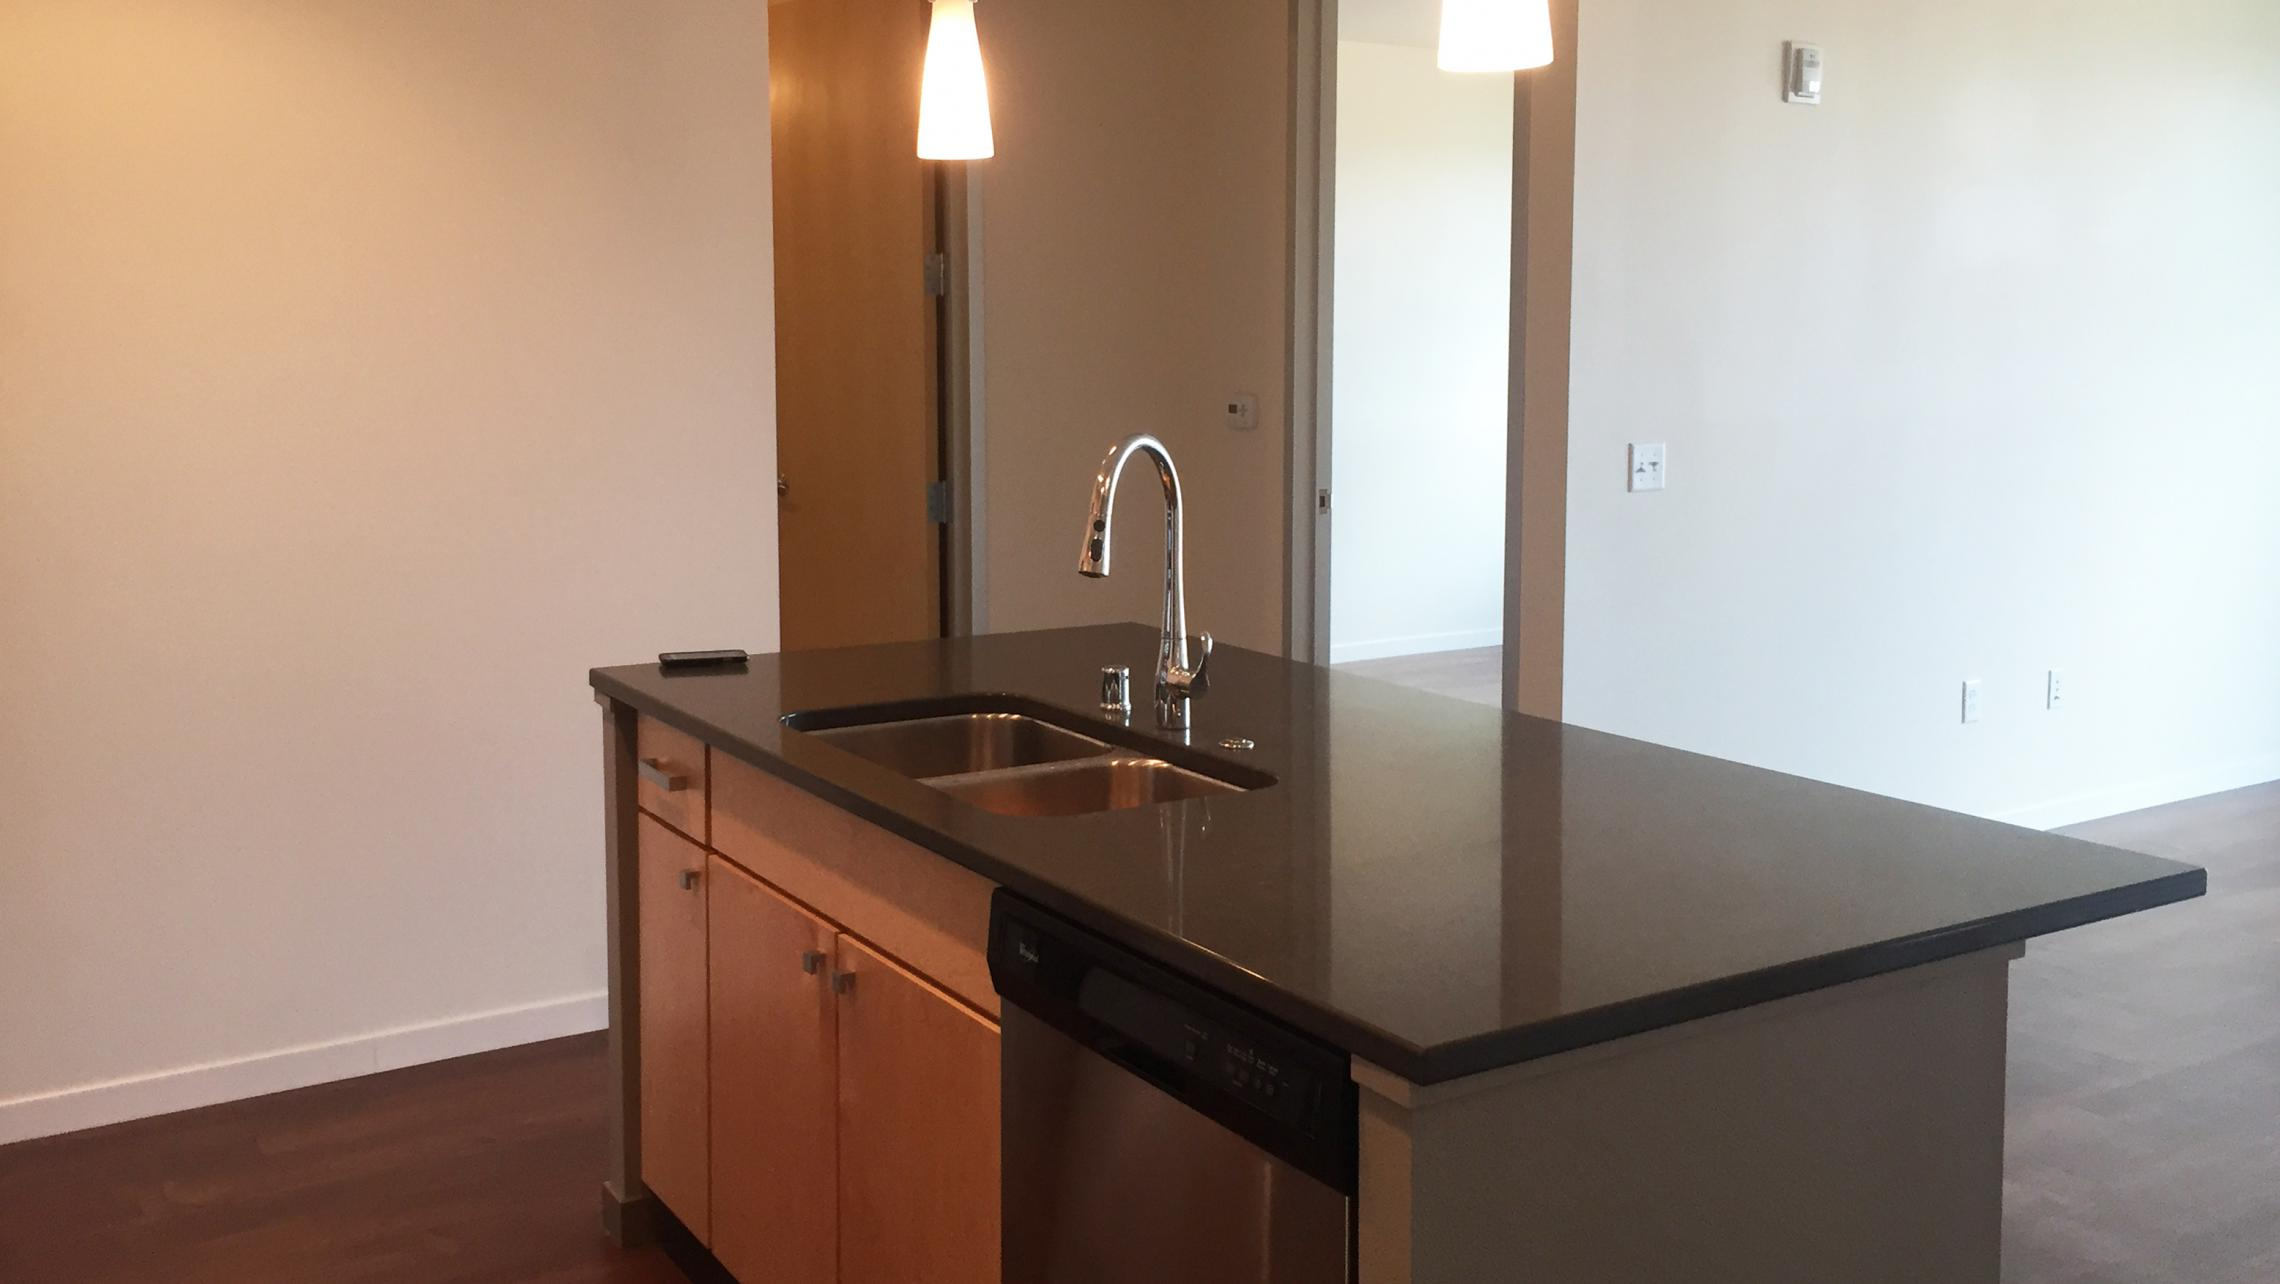 ULI Nine Line Apartment 519 - Kitchen Island